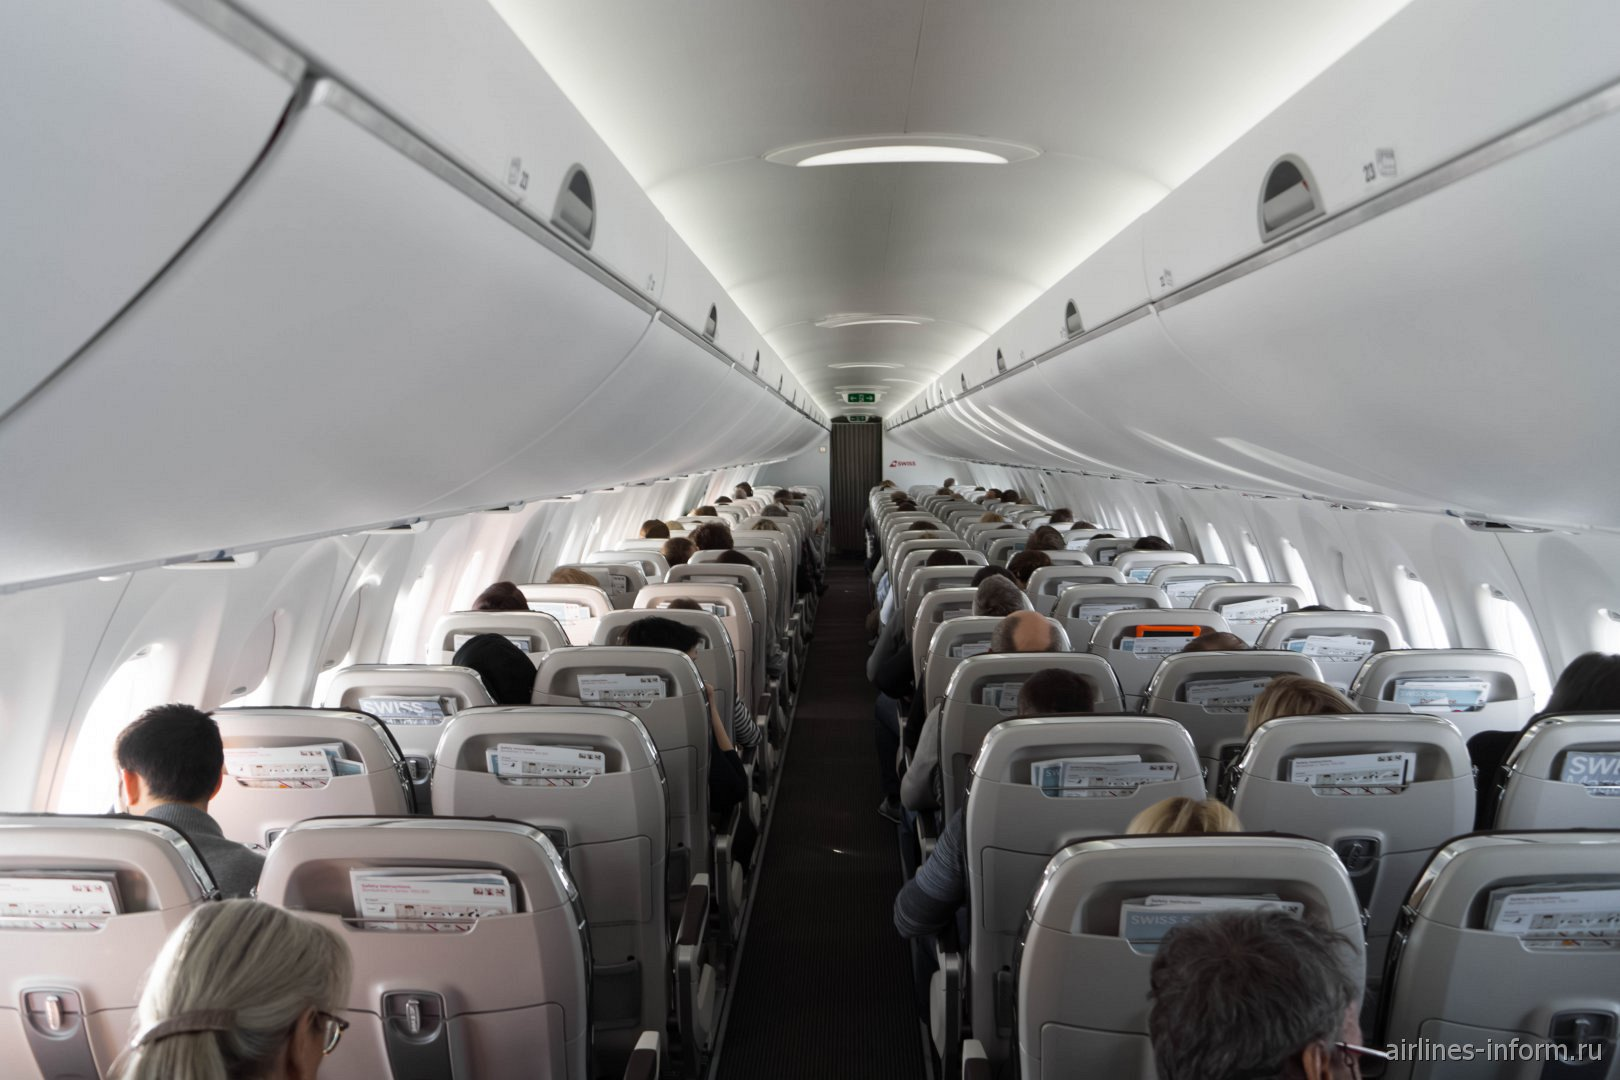 Пассажирский салон самолета Bombardier CS100 авиакомпании SWISS